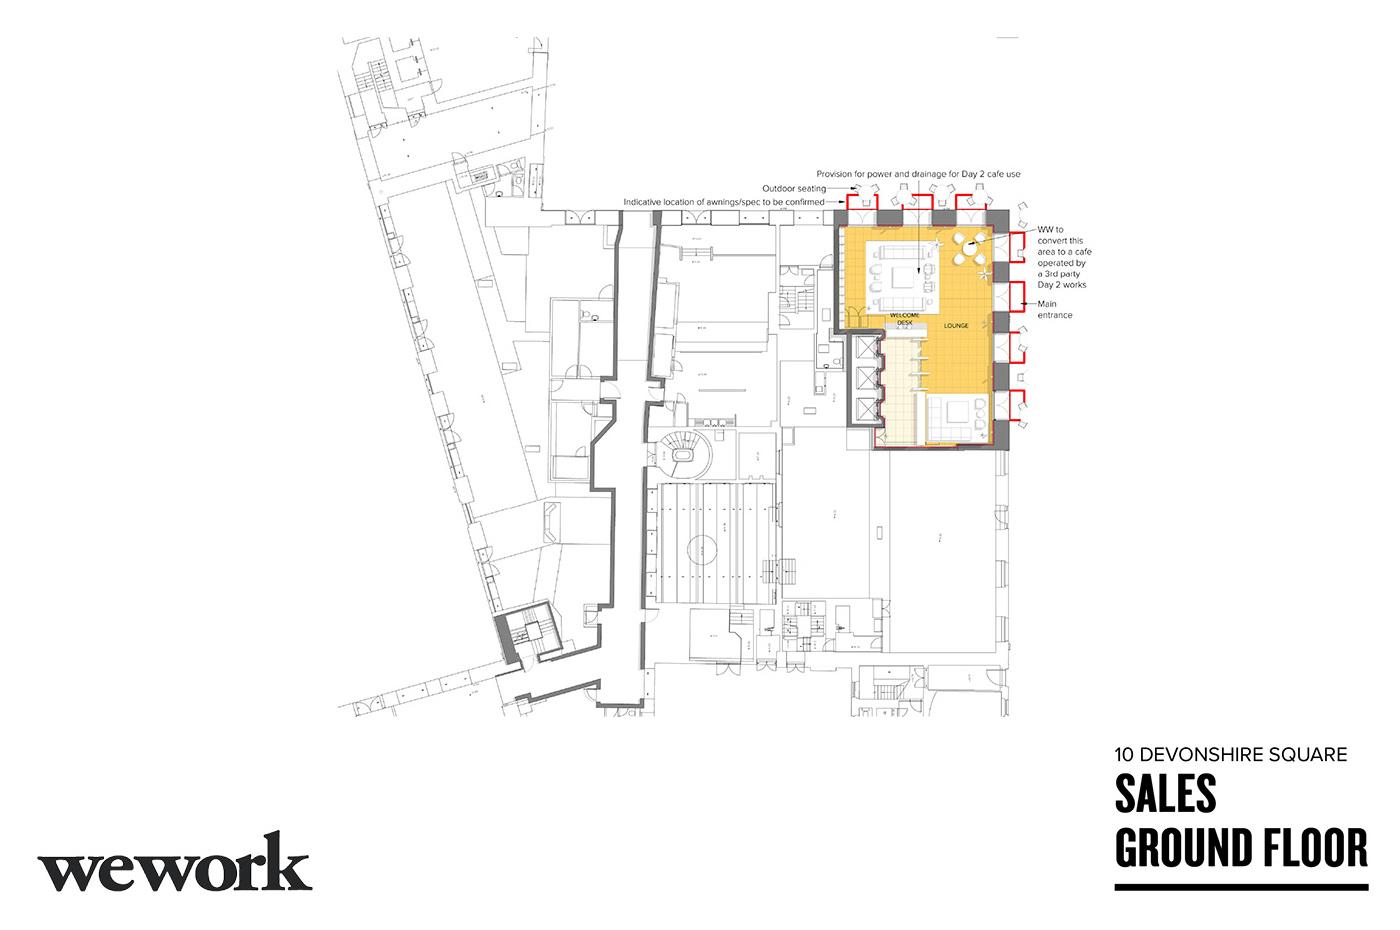 floorplans-12 copy.jpg